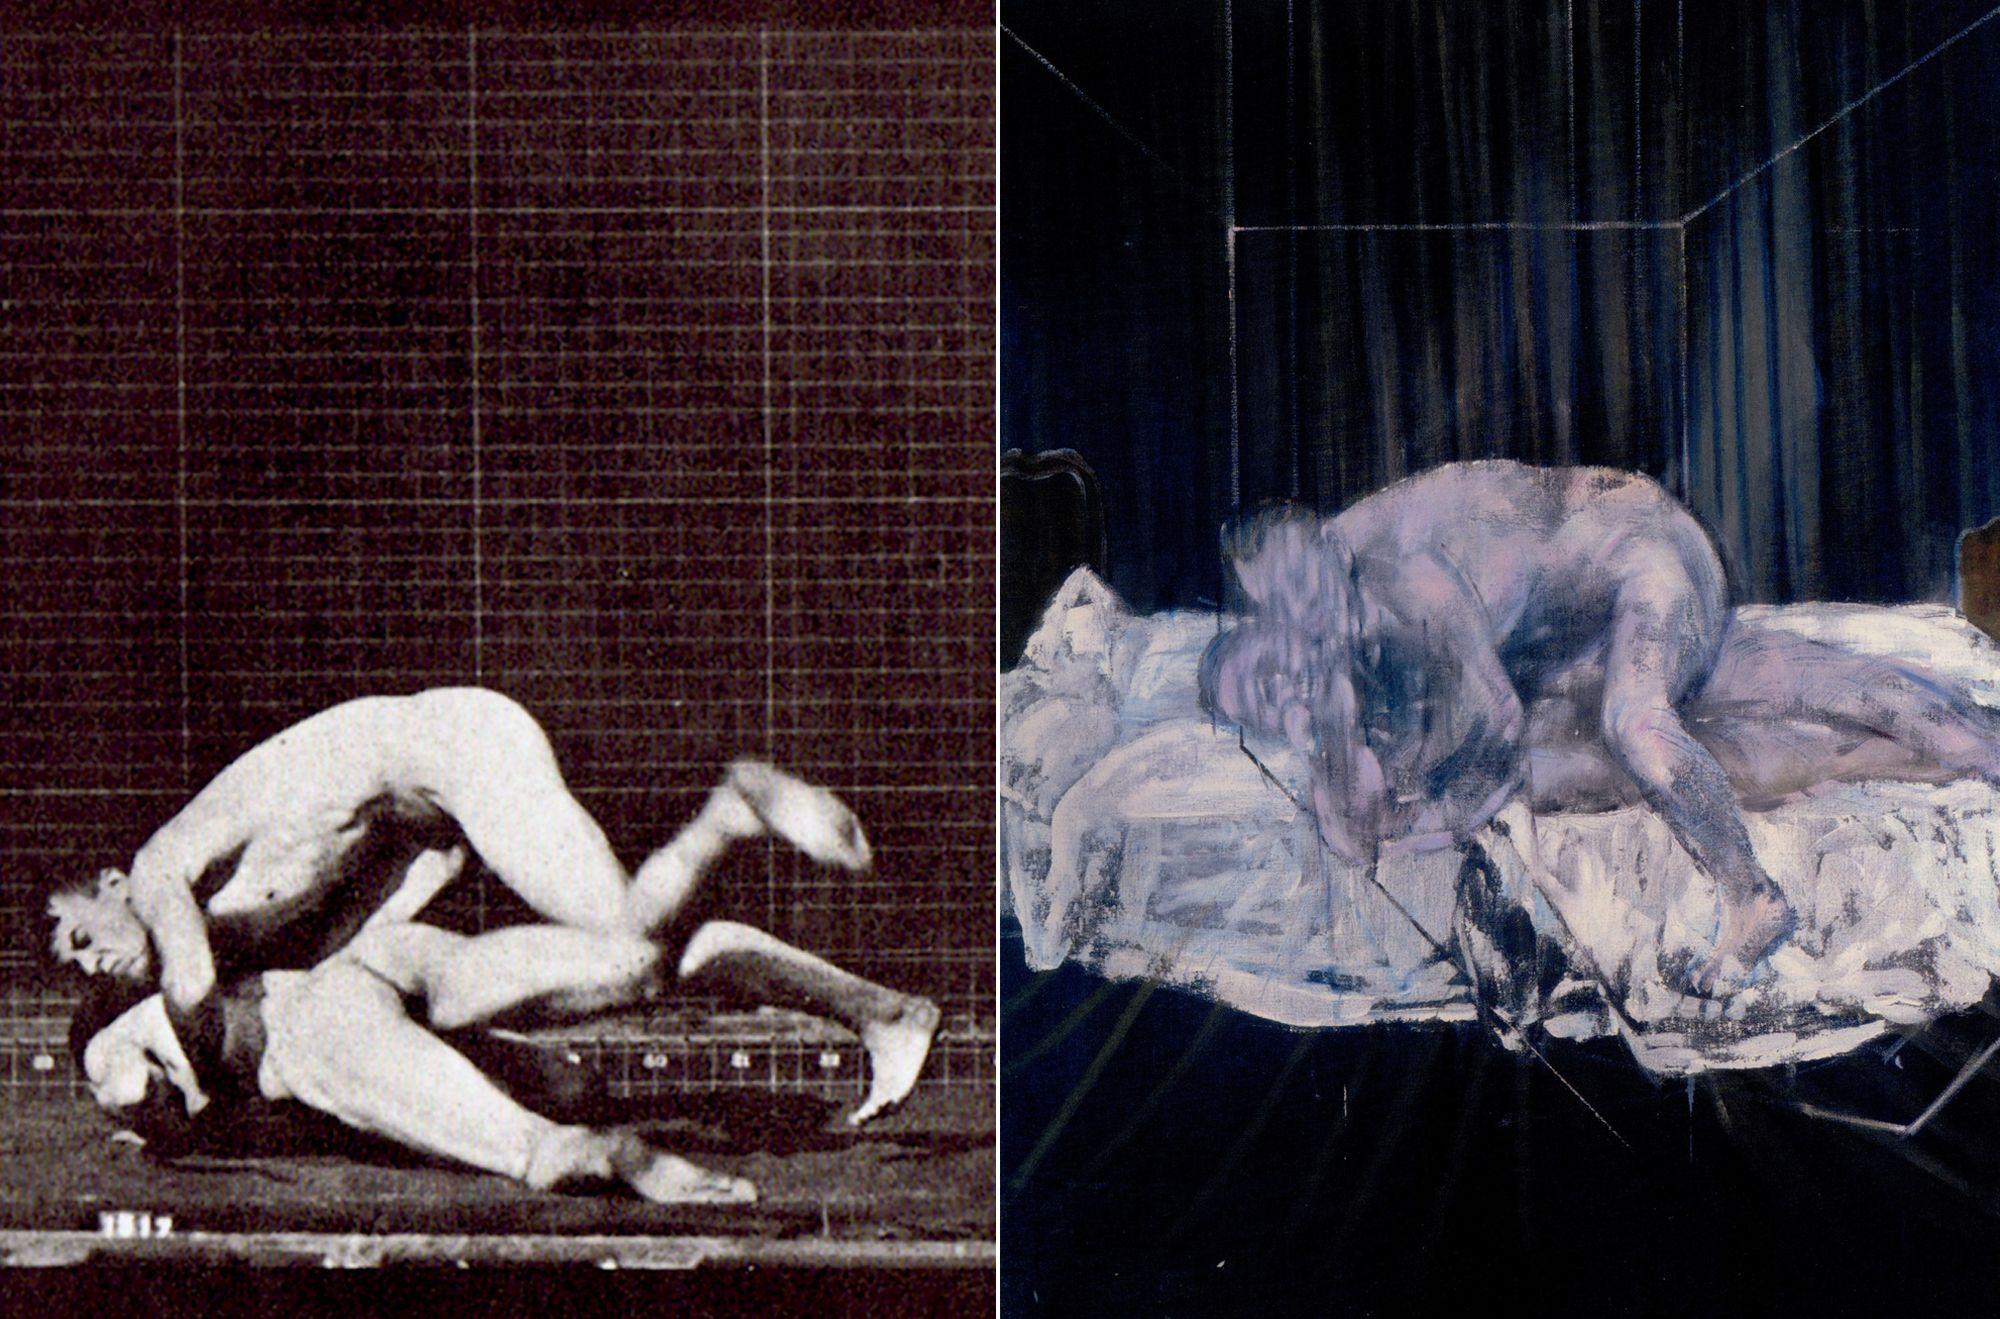 Edward Muybridge, Wrestlers, circa 1880 - Francis Bacon, Two Figures, 1953, foto via Pinterest